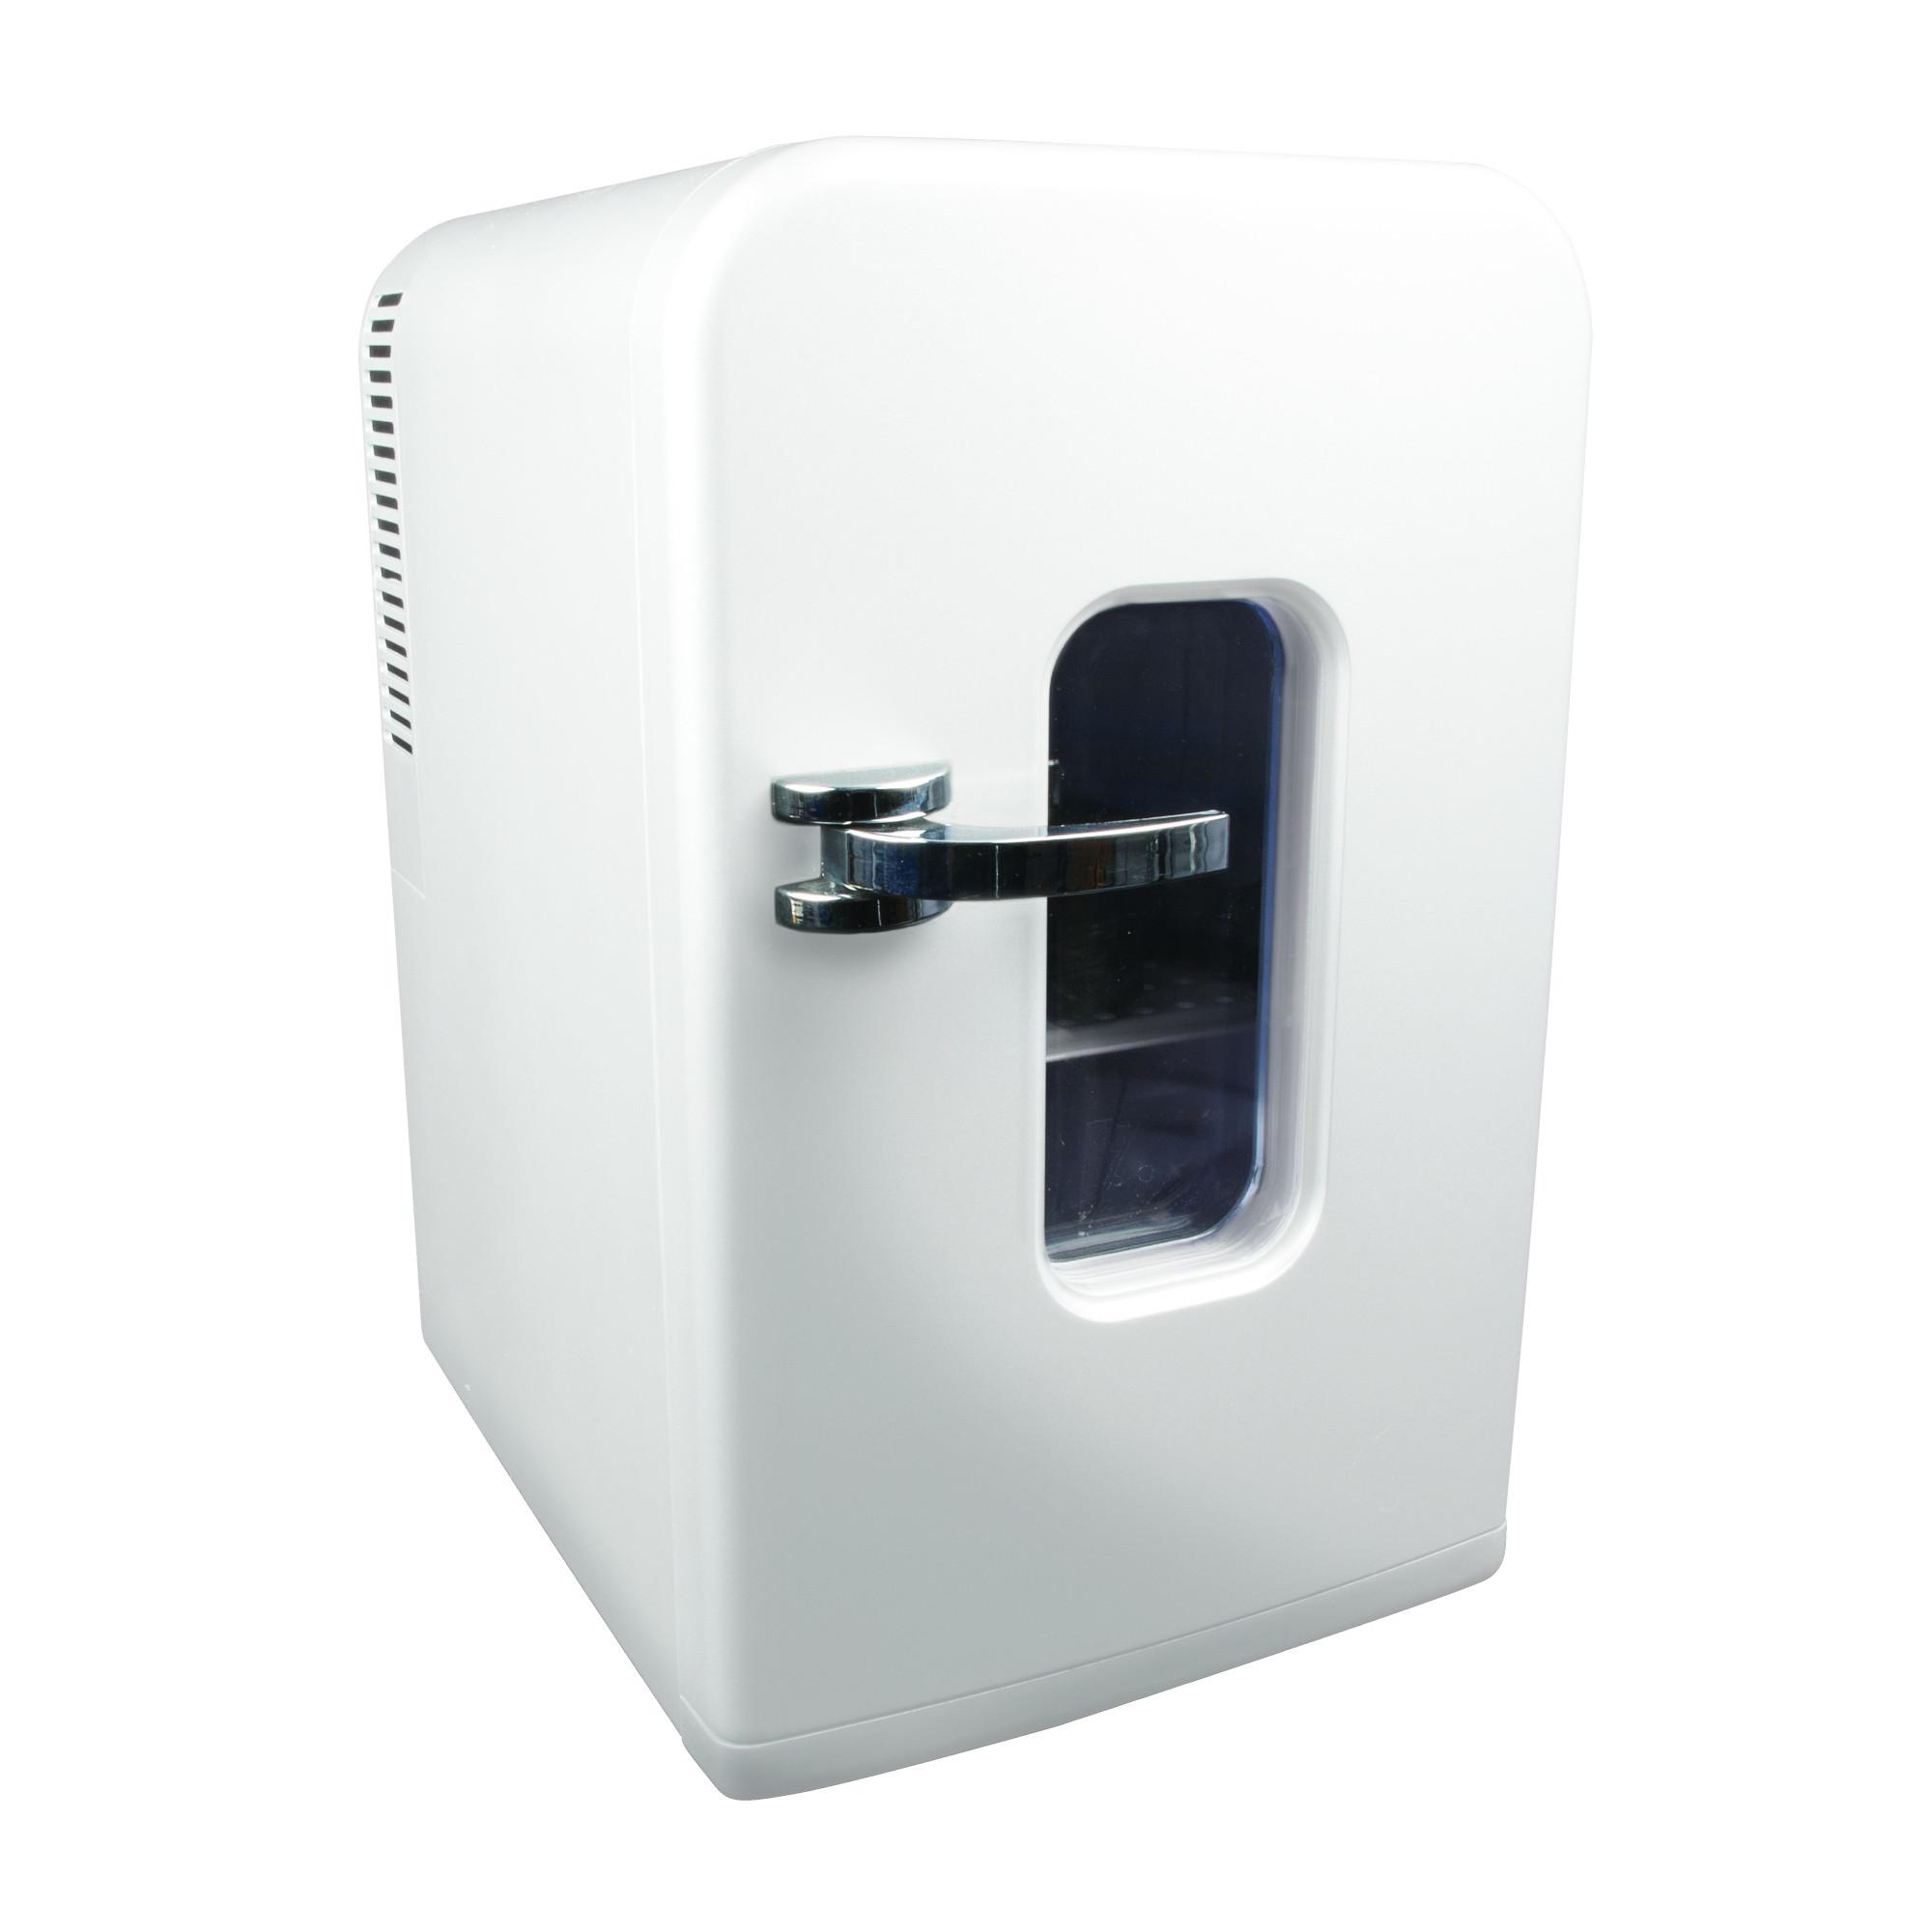 Solar Powered Mini Fridge Maplin Combined 15l 48w Mini Fridge Cooler Warmer Ac Dc 230v Or